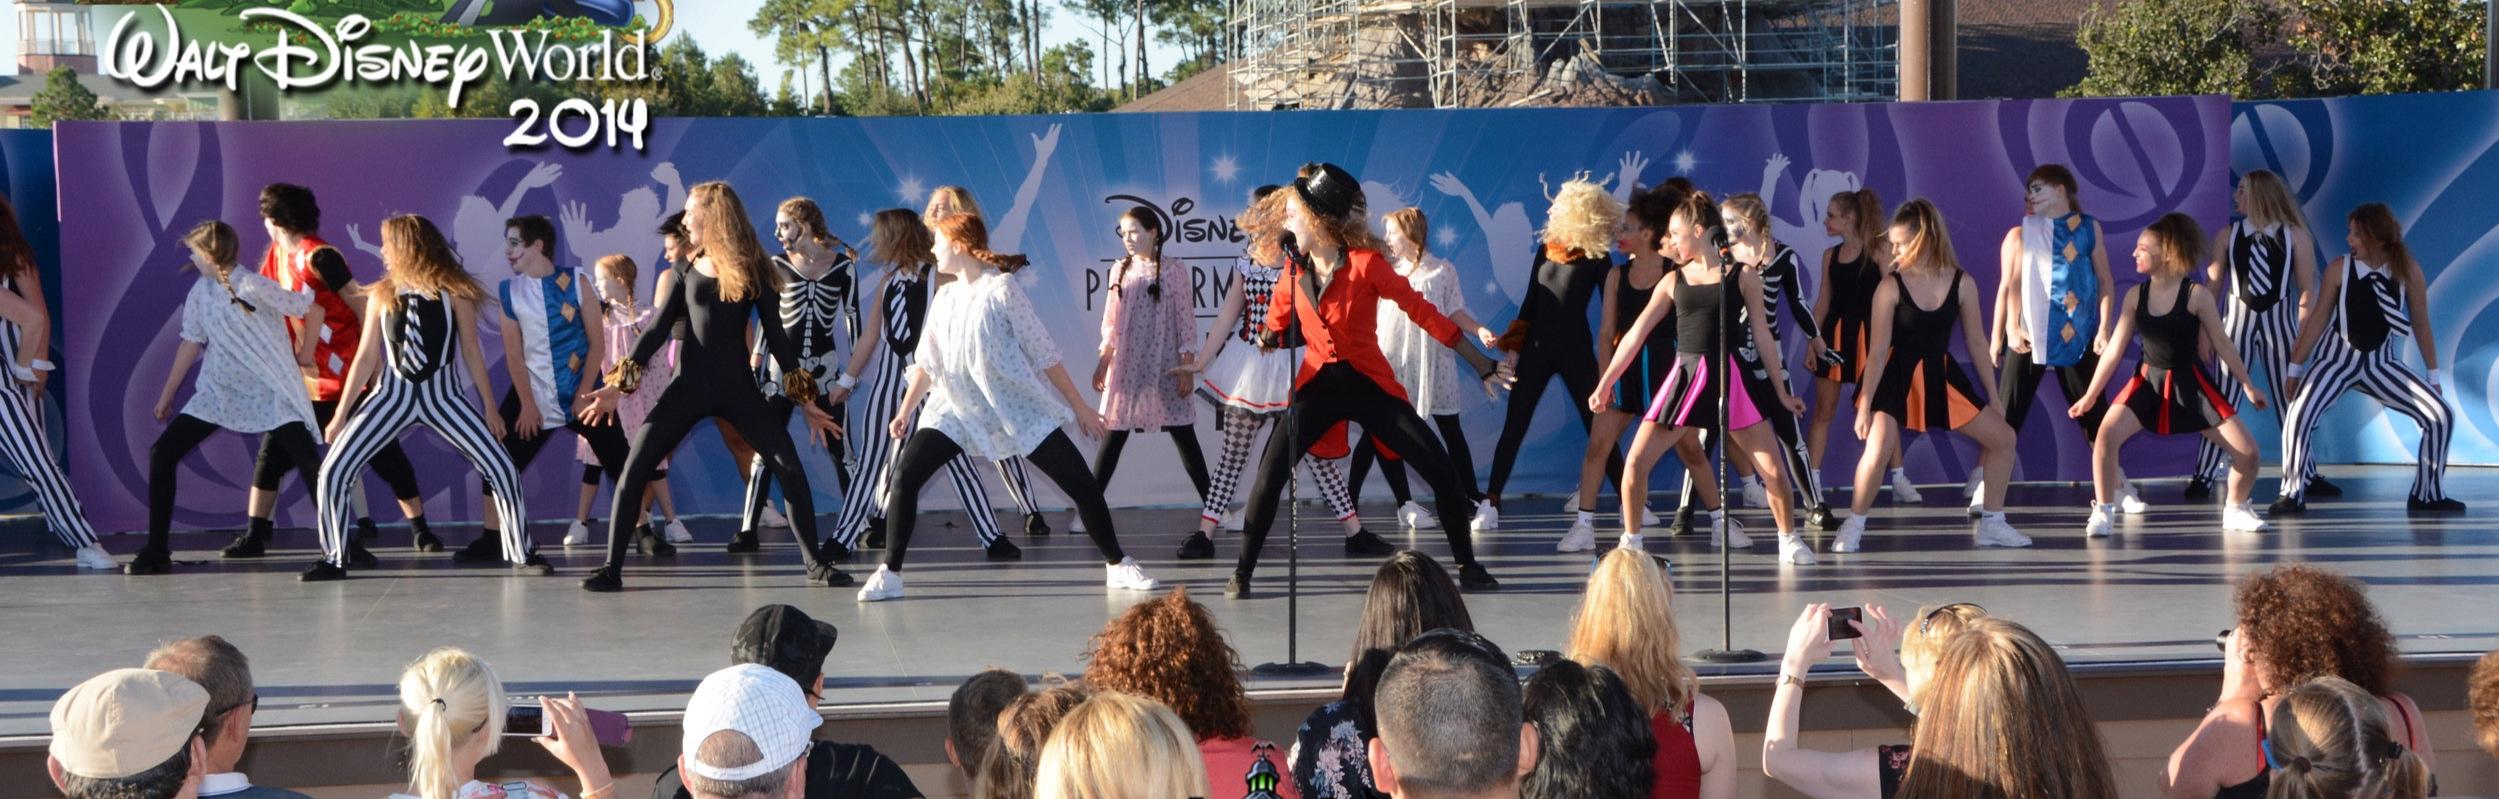 Artemis+performing+at+Walt+Disney+World+2014